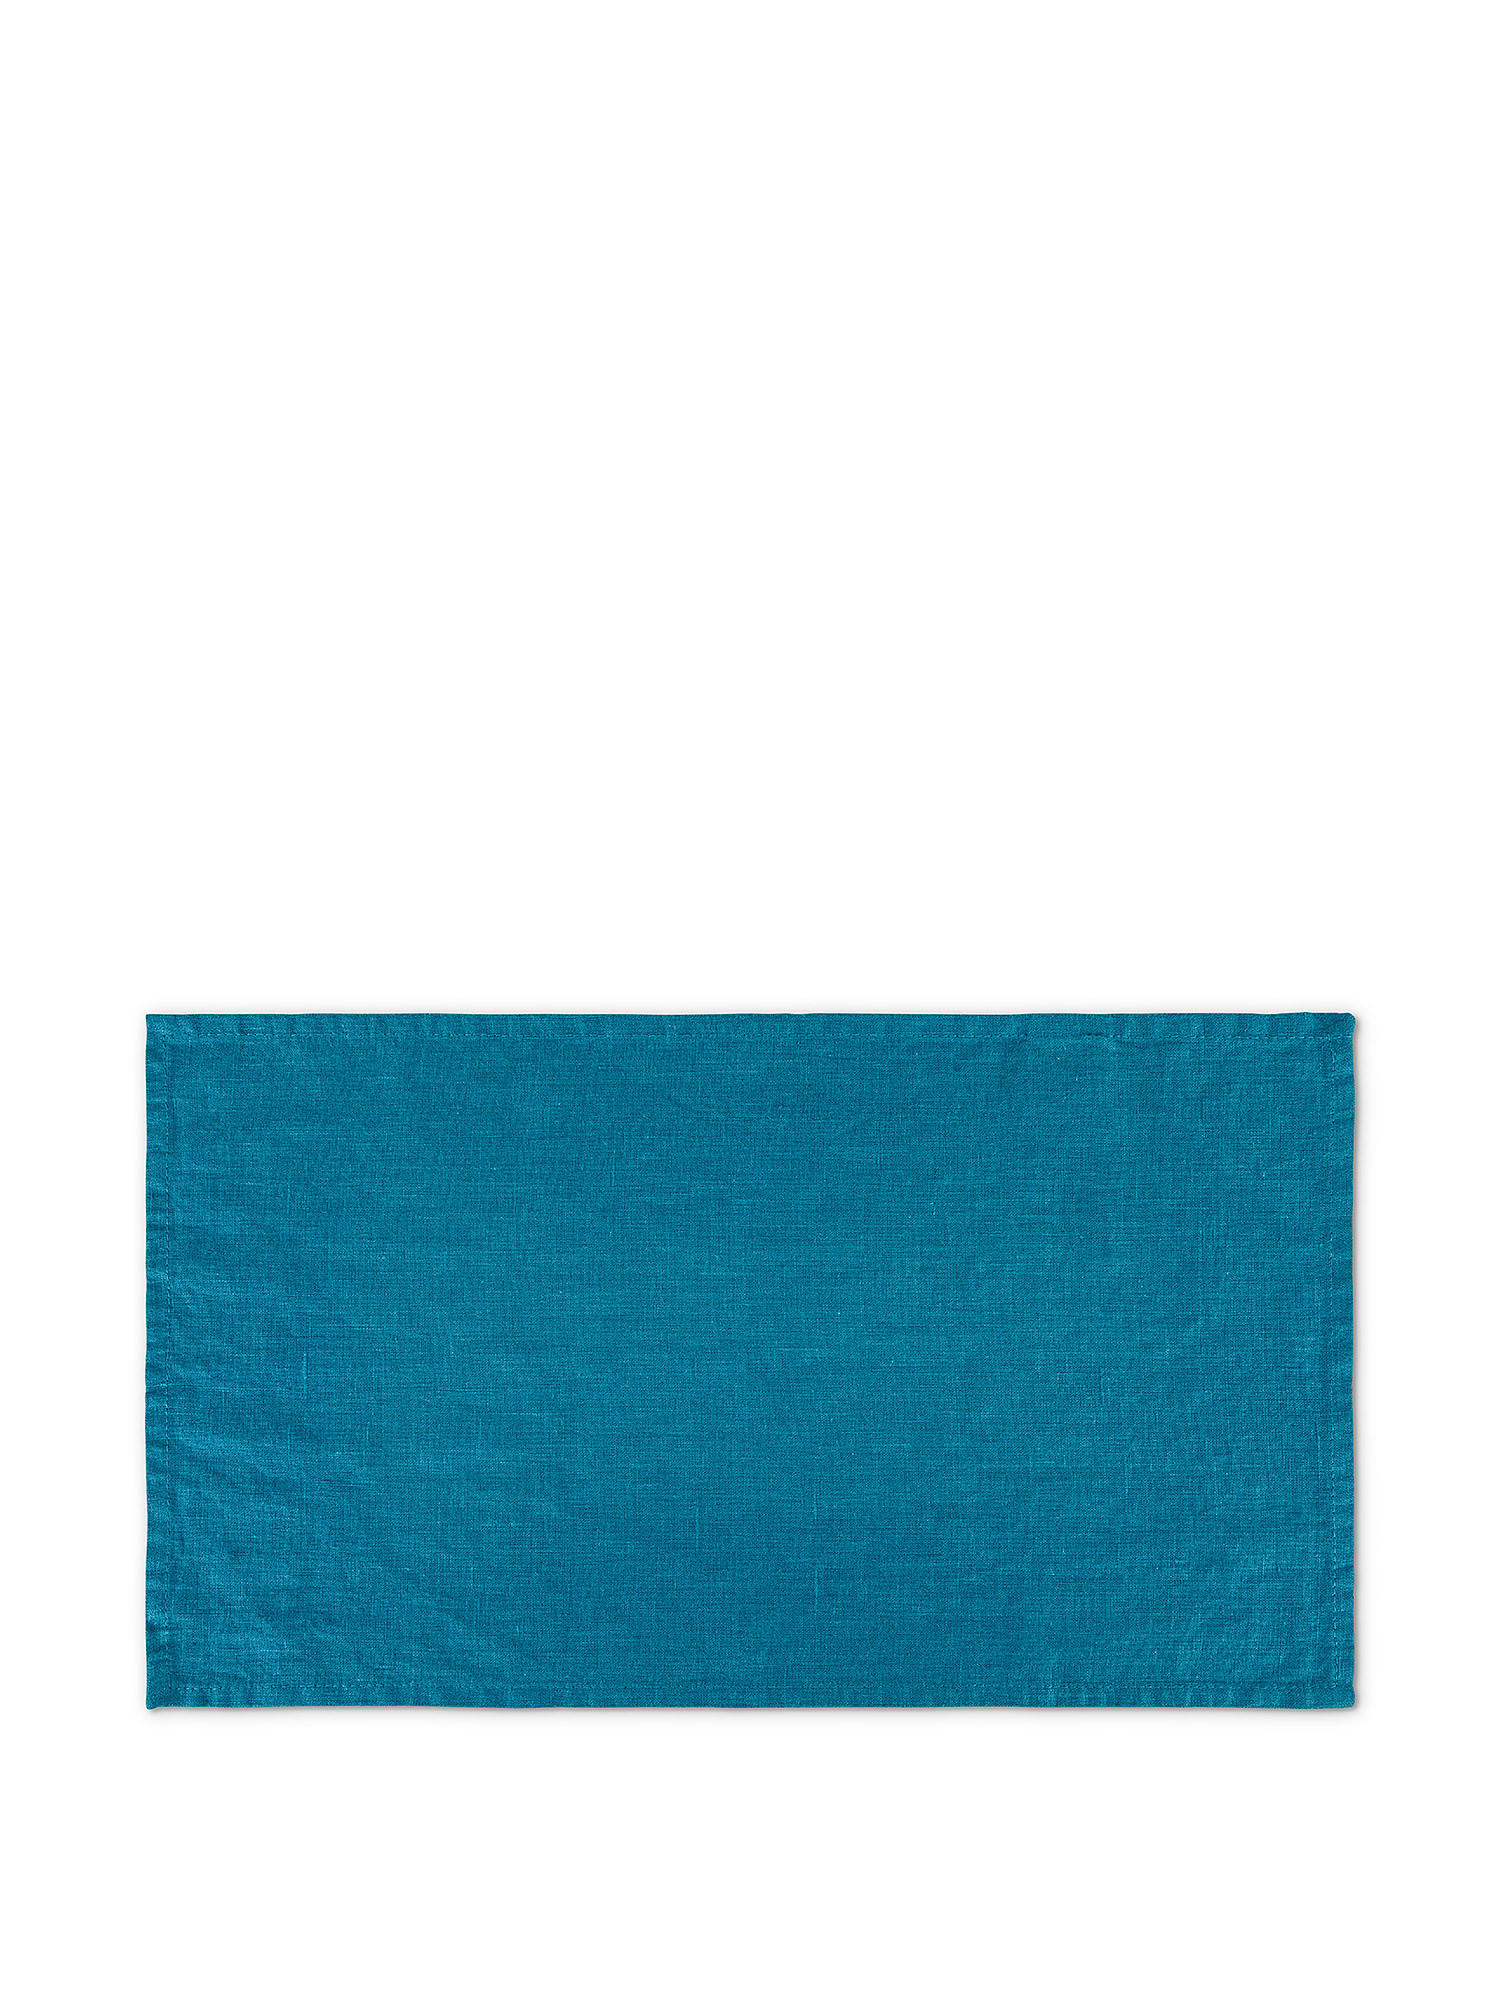 Tovaglietta lino lavato tinta unita, Petrolio, large image number 0